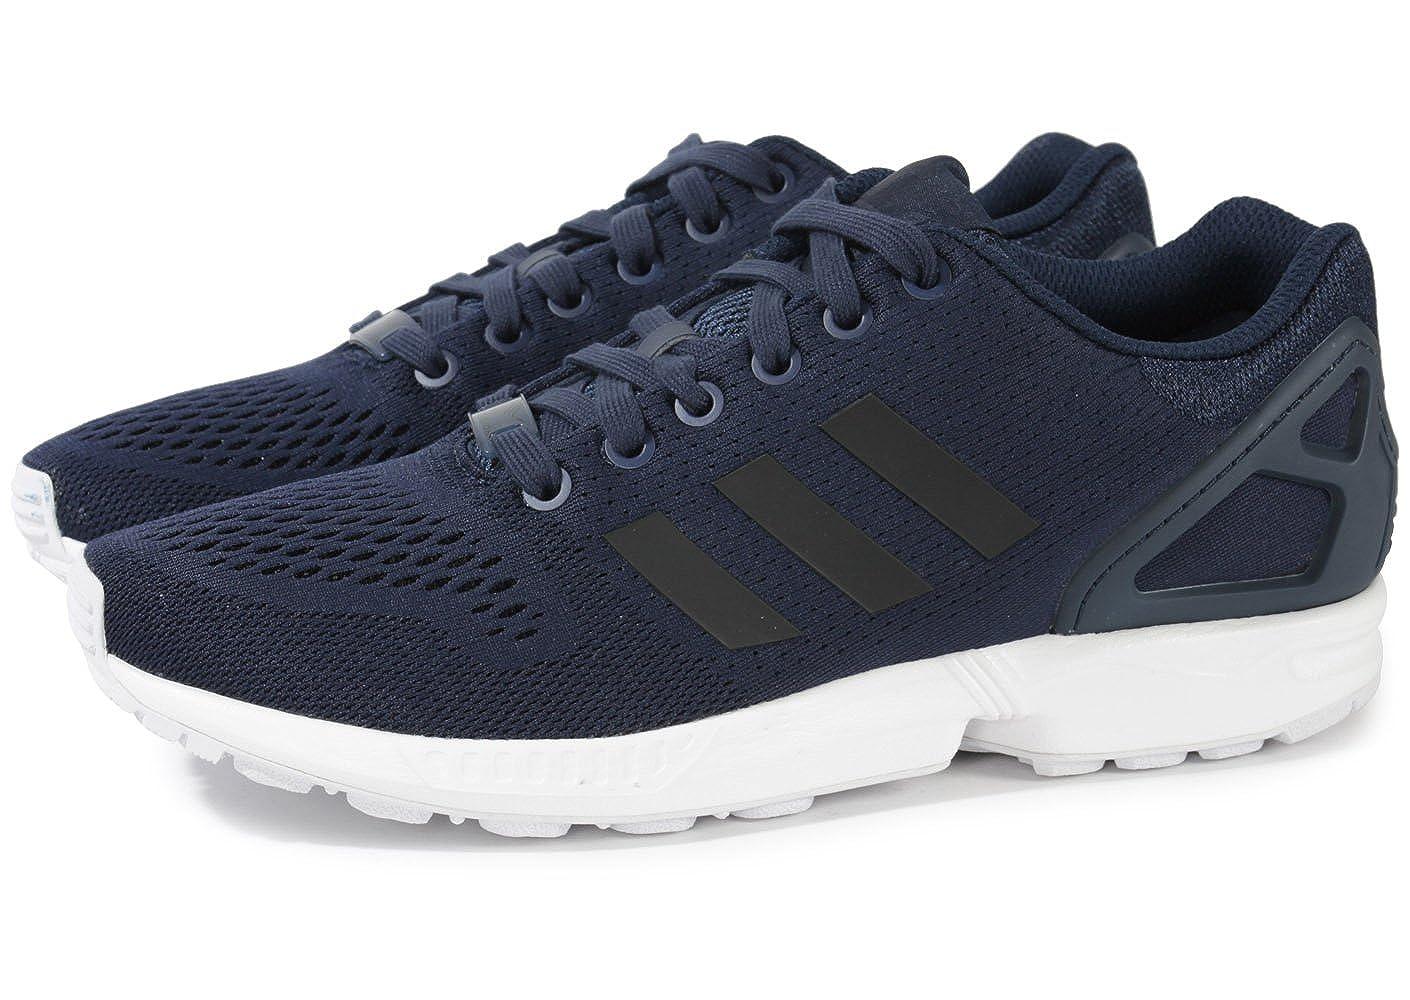 new concept 7ab7e fcb65 Adidas ZX Flux Navy Blue 41?: Amazon.co.uk: Shoes & Bags